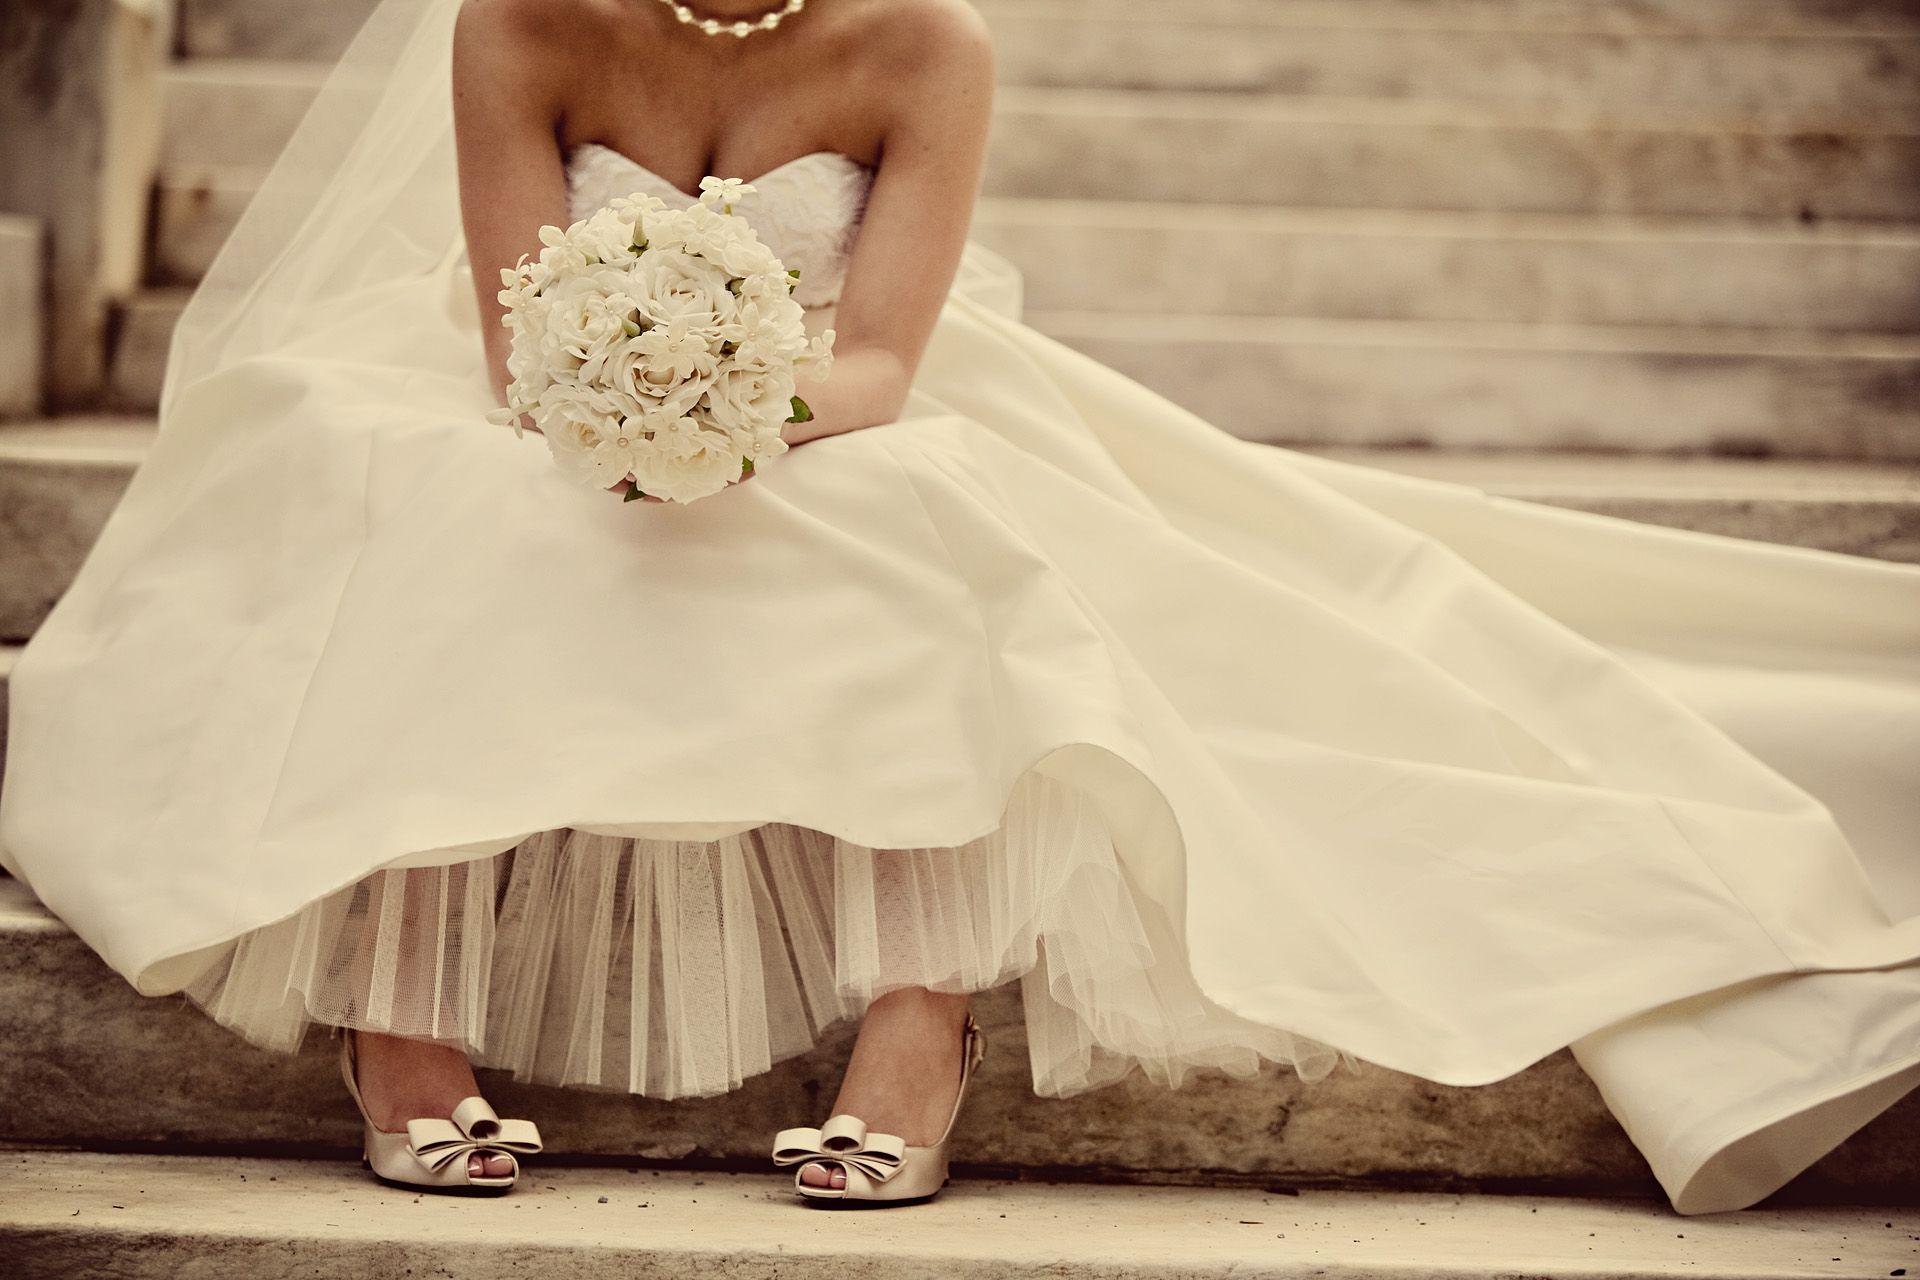 10 Outrageous Celebrity Wedding Dresses